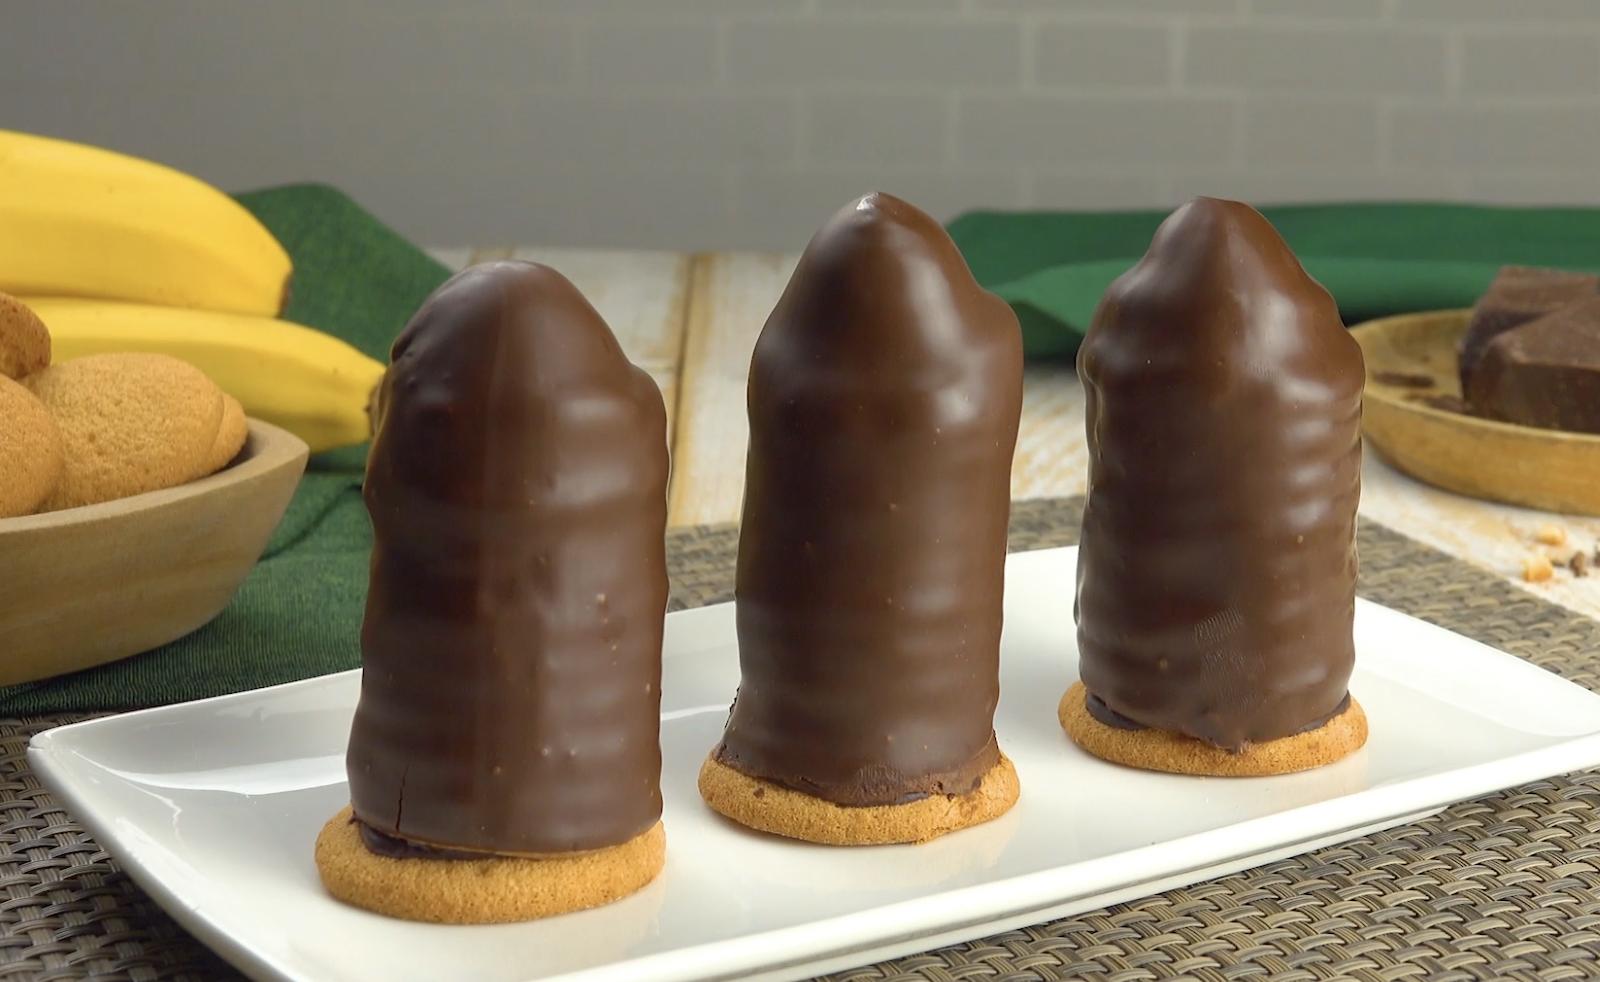 Tours de chocolat garnies à la banane